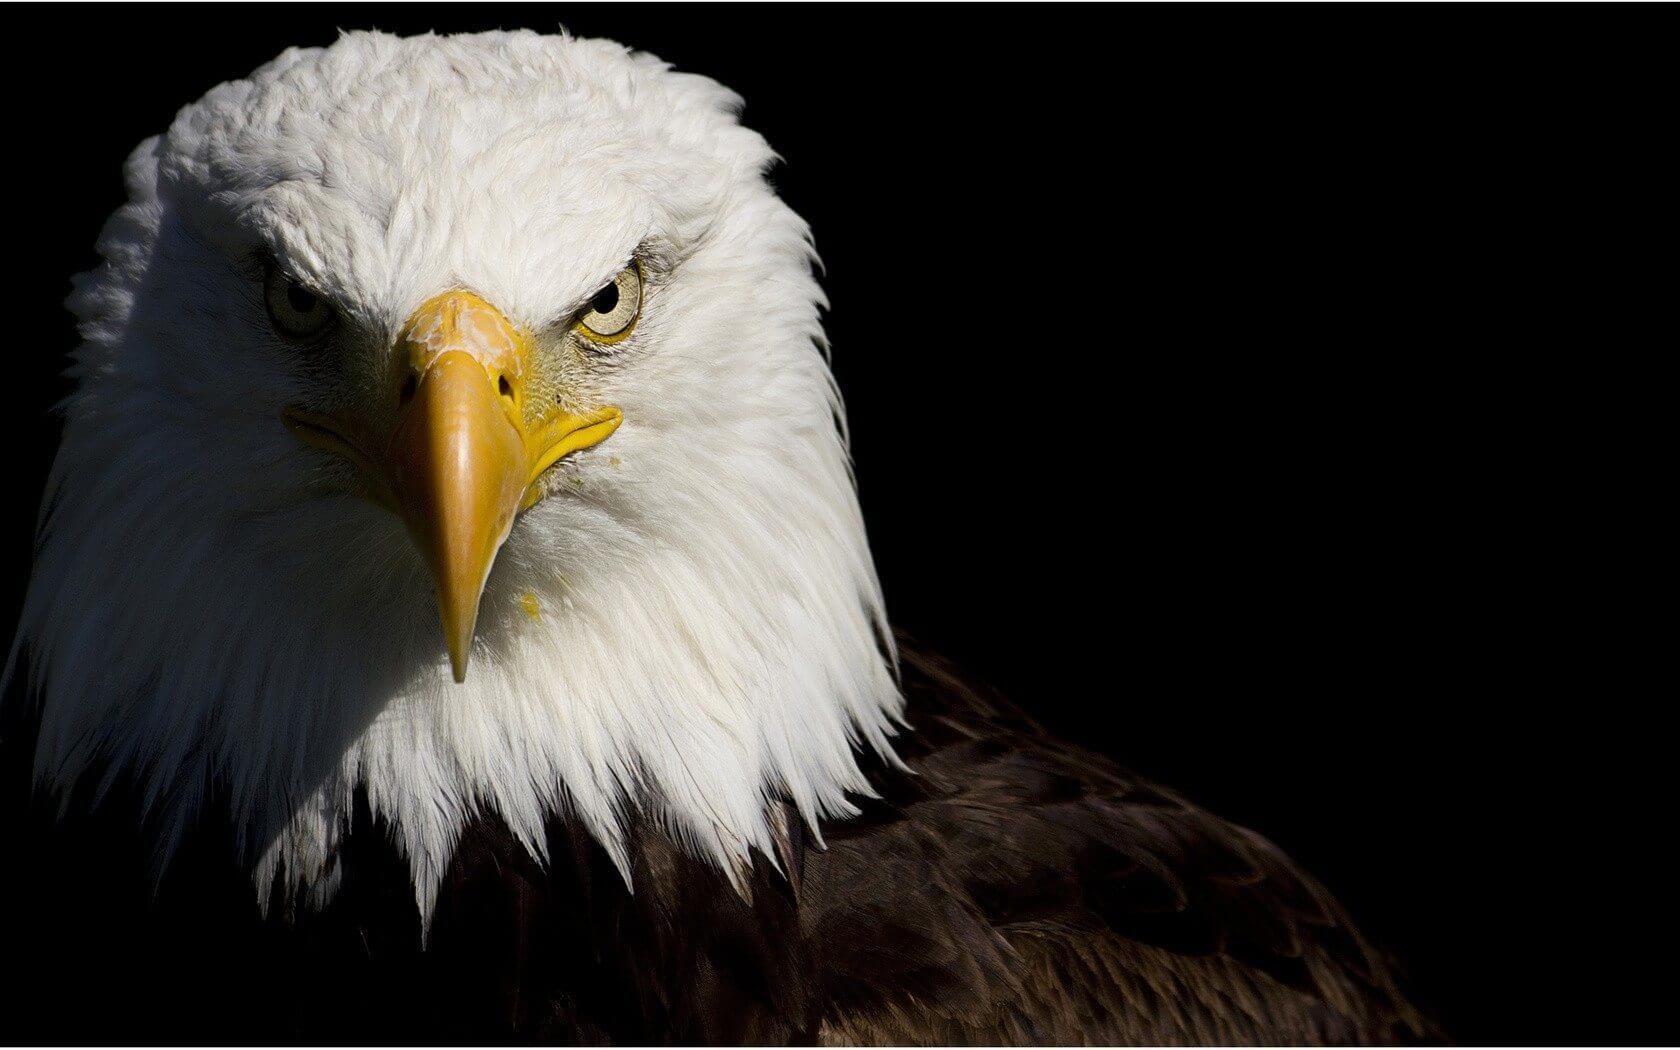 smt drones eagle